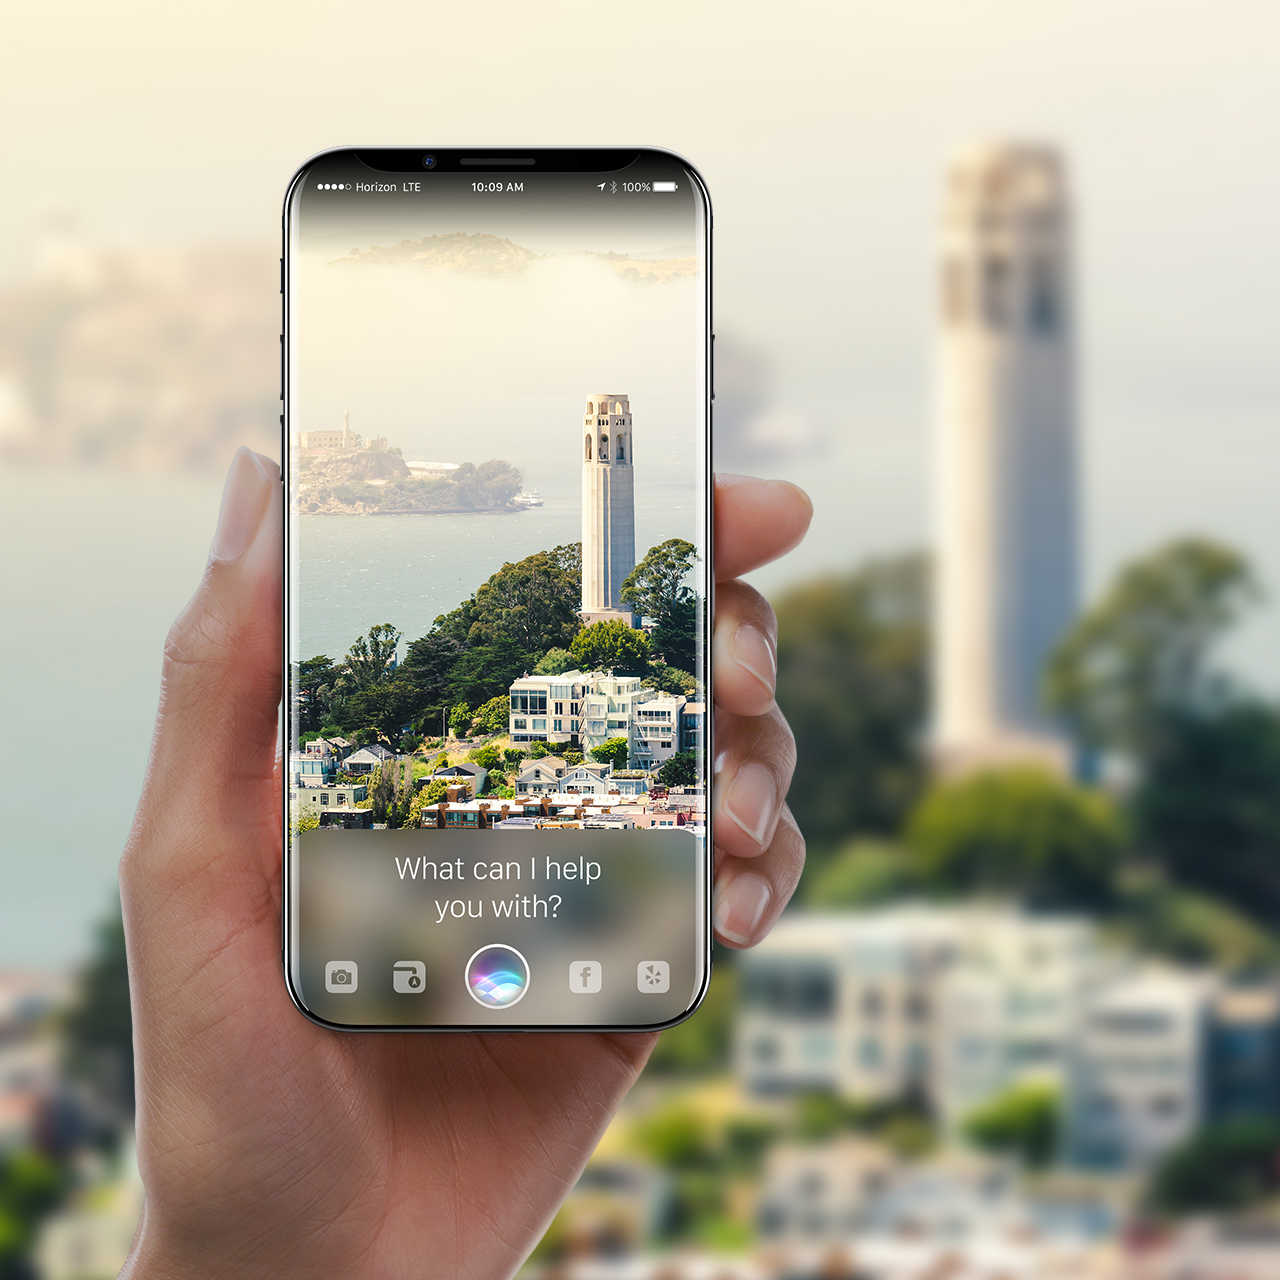 iOS 11 Rumors Siri in iMessage and iCloud